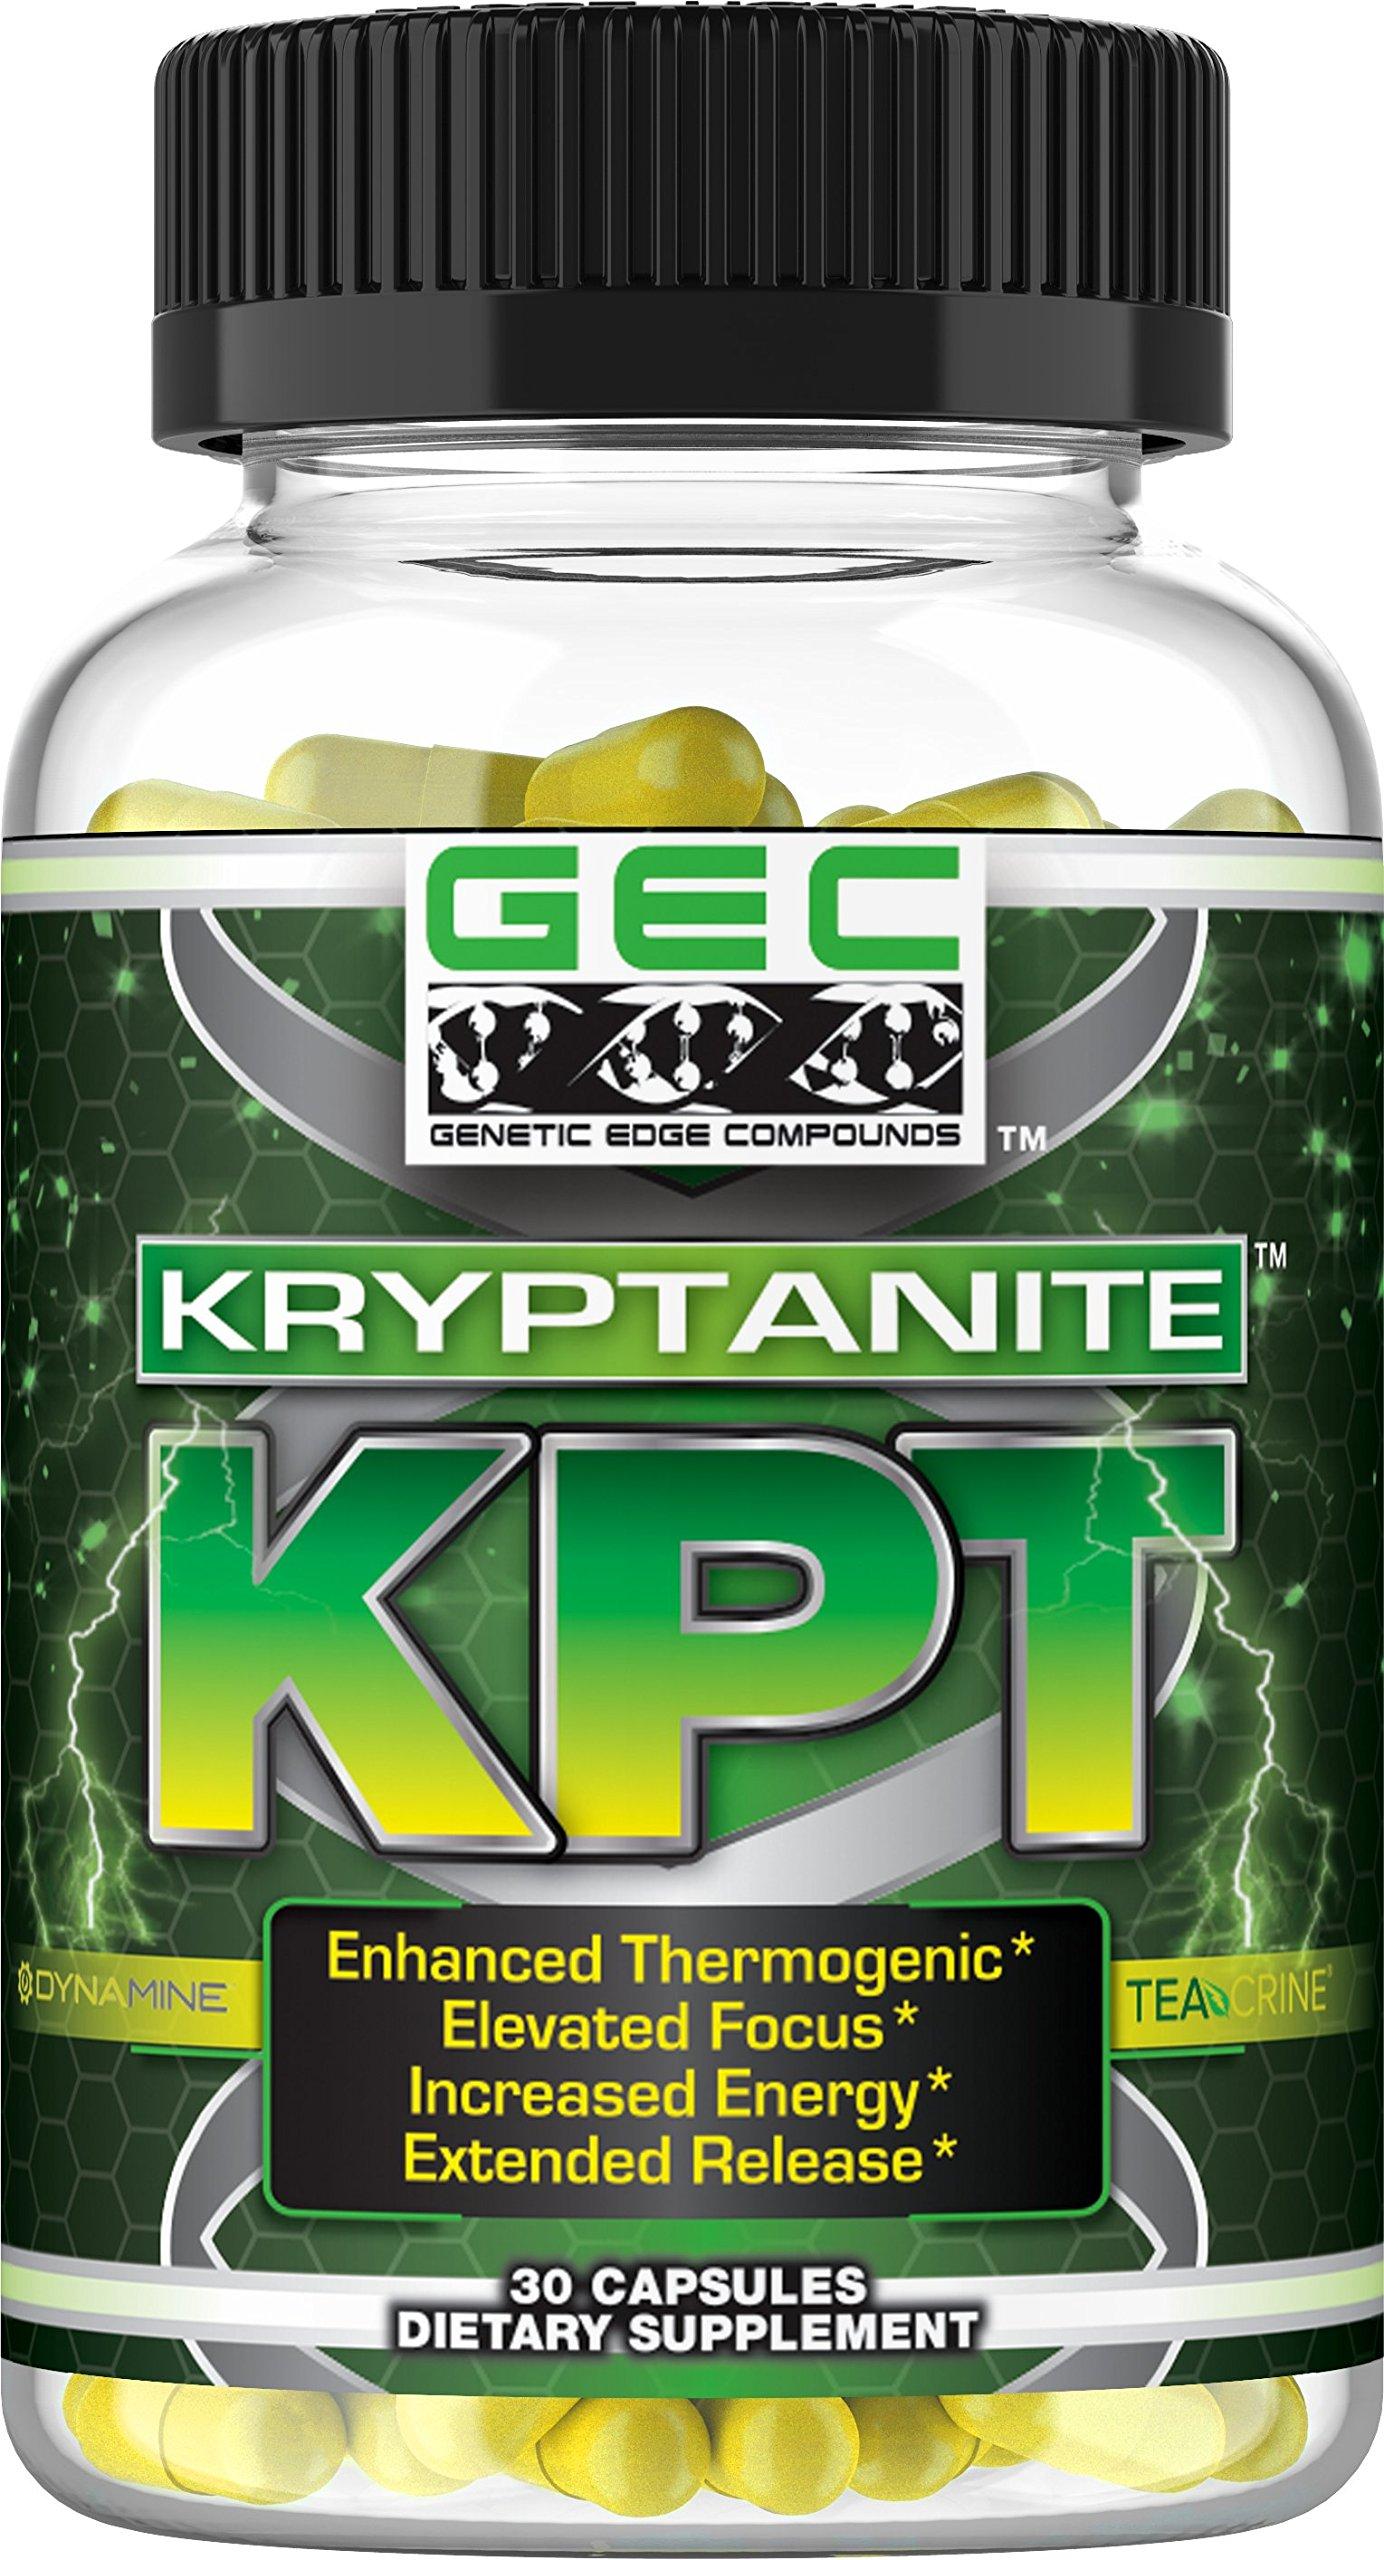 GEC Kryptanite Enhanced Thermogenic by GENETIC EDGE COMPOUNDS